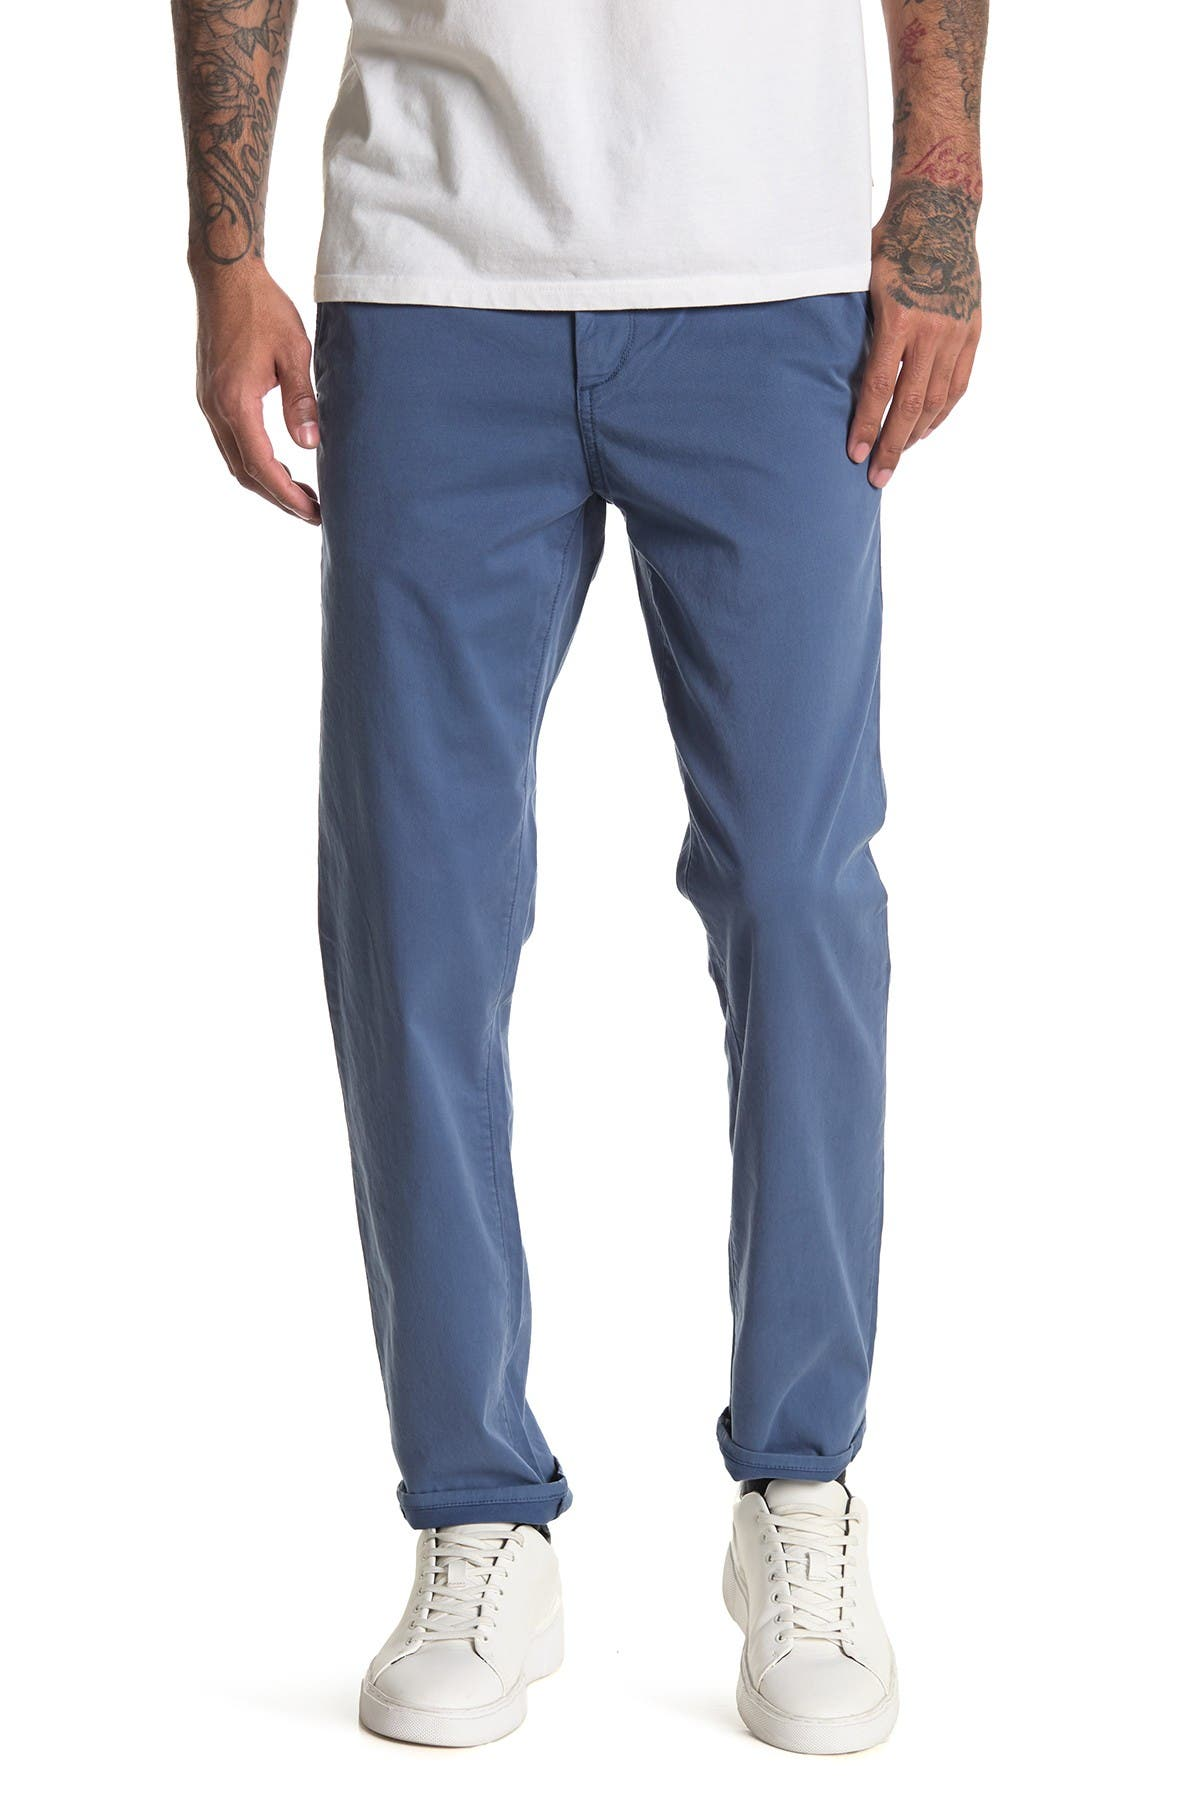 Image of Rag & Bone Classic Chino Pants